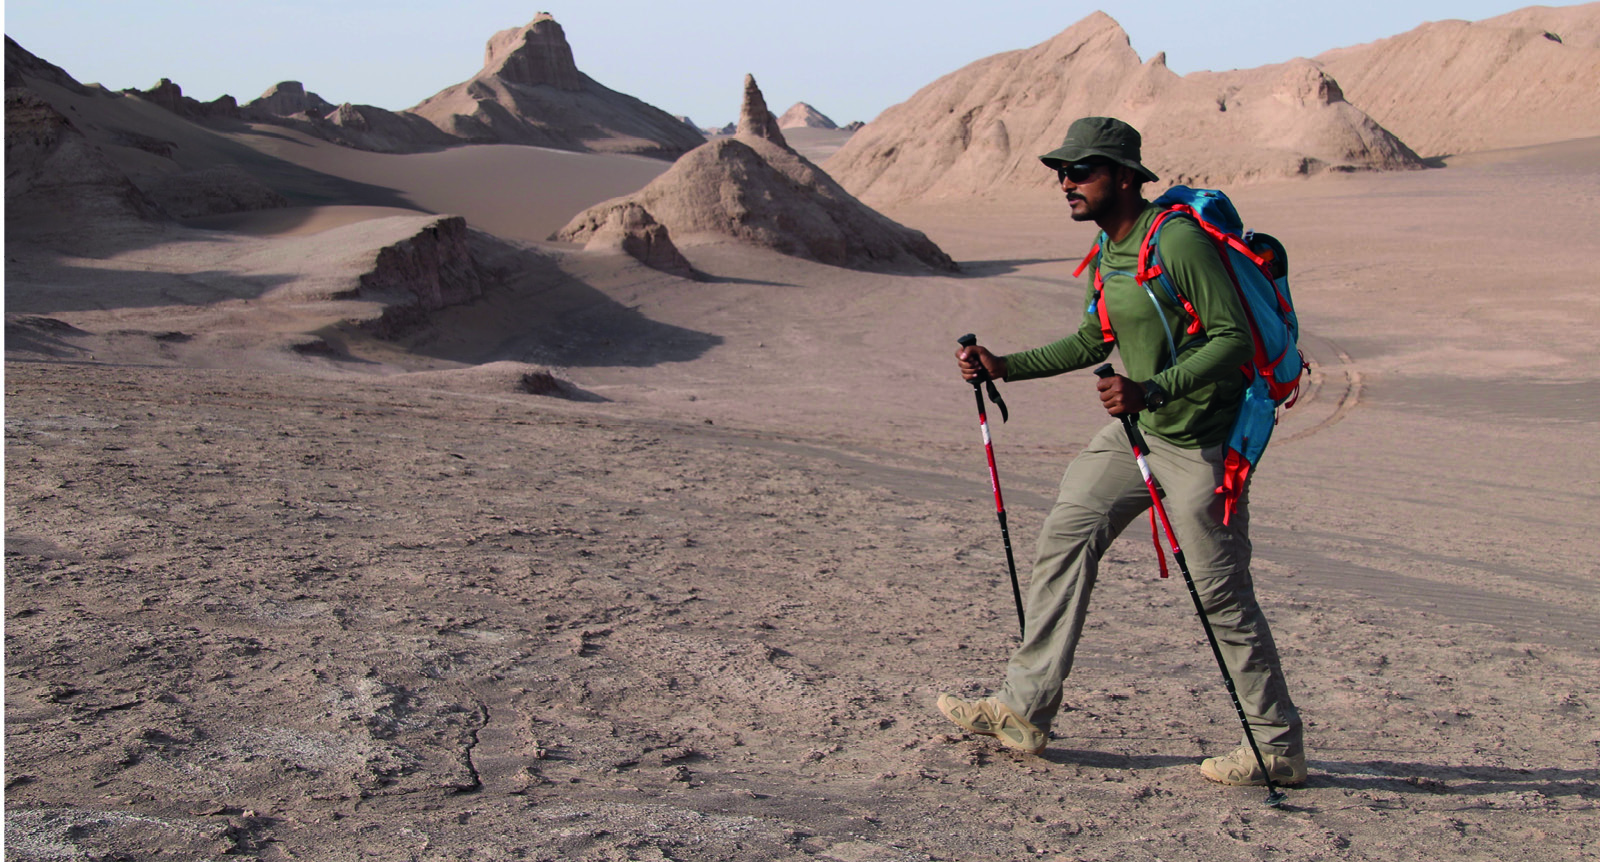 Man in Iran's Lut Desert trekking with trekking poles on team expedition  with Secret Compass | Secret Compass